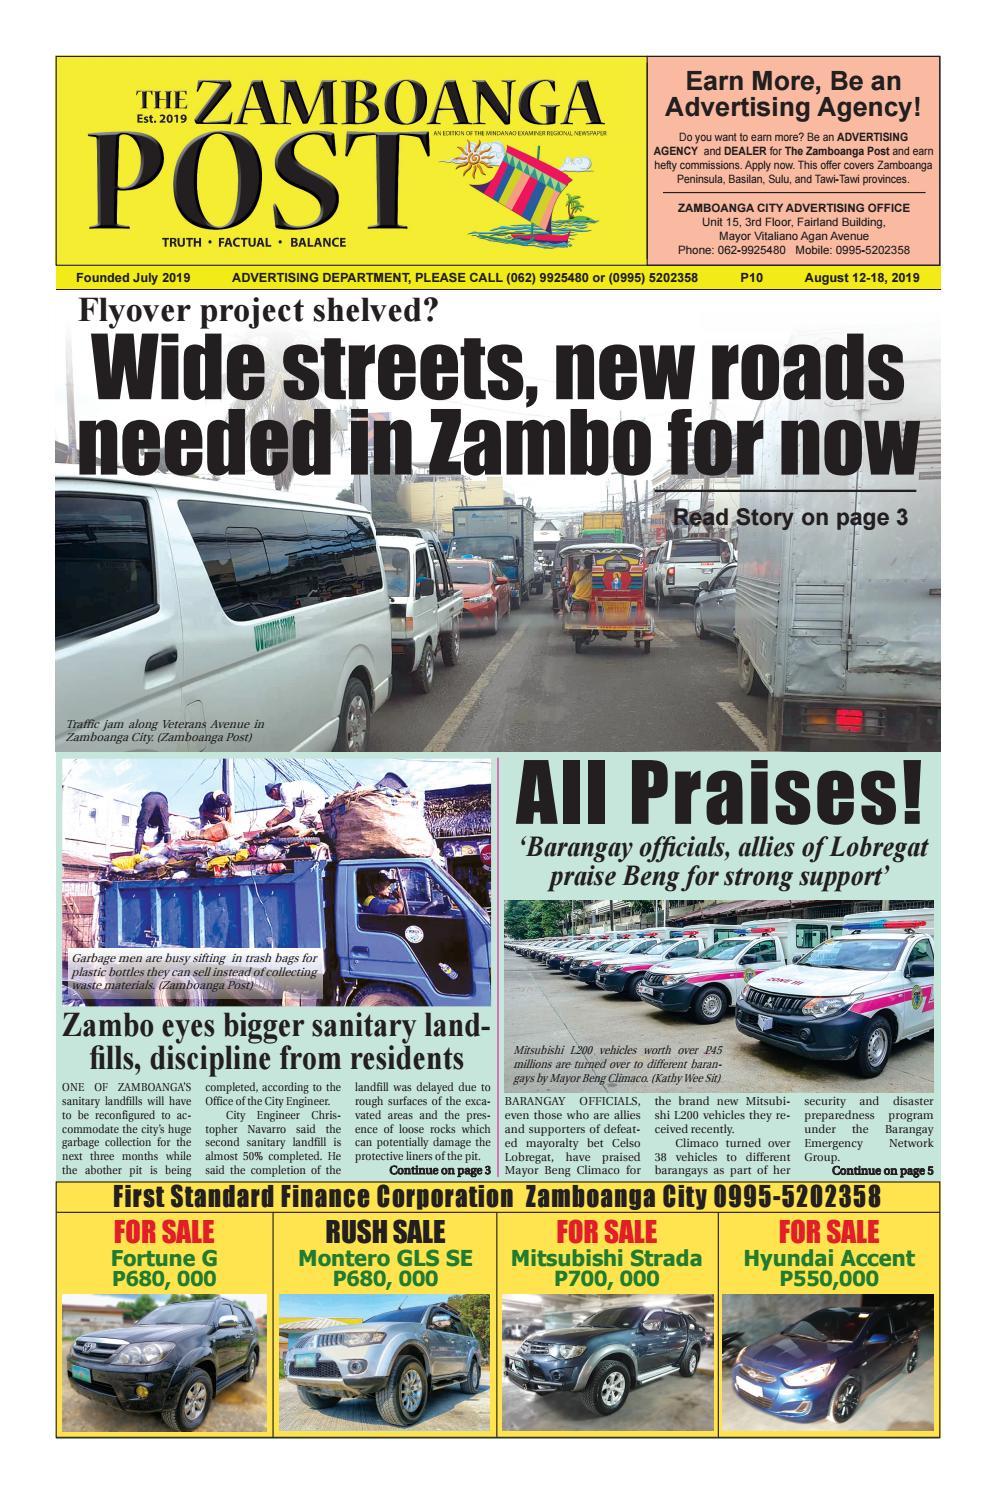 The Zamboanga Post (August 12-18, 2019) by Mindanao Examiner